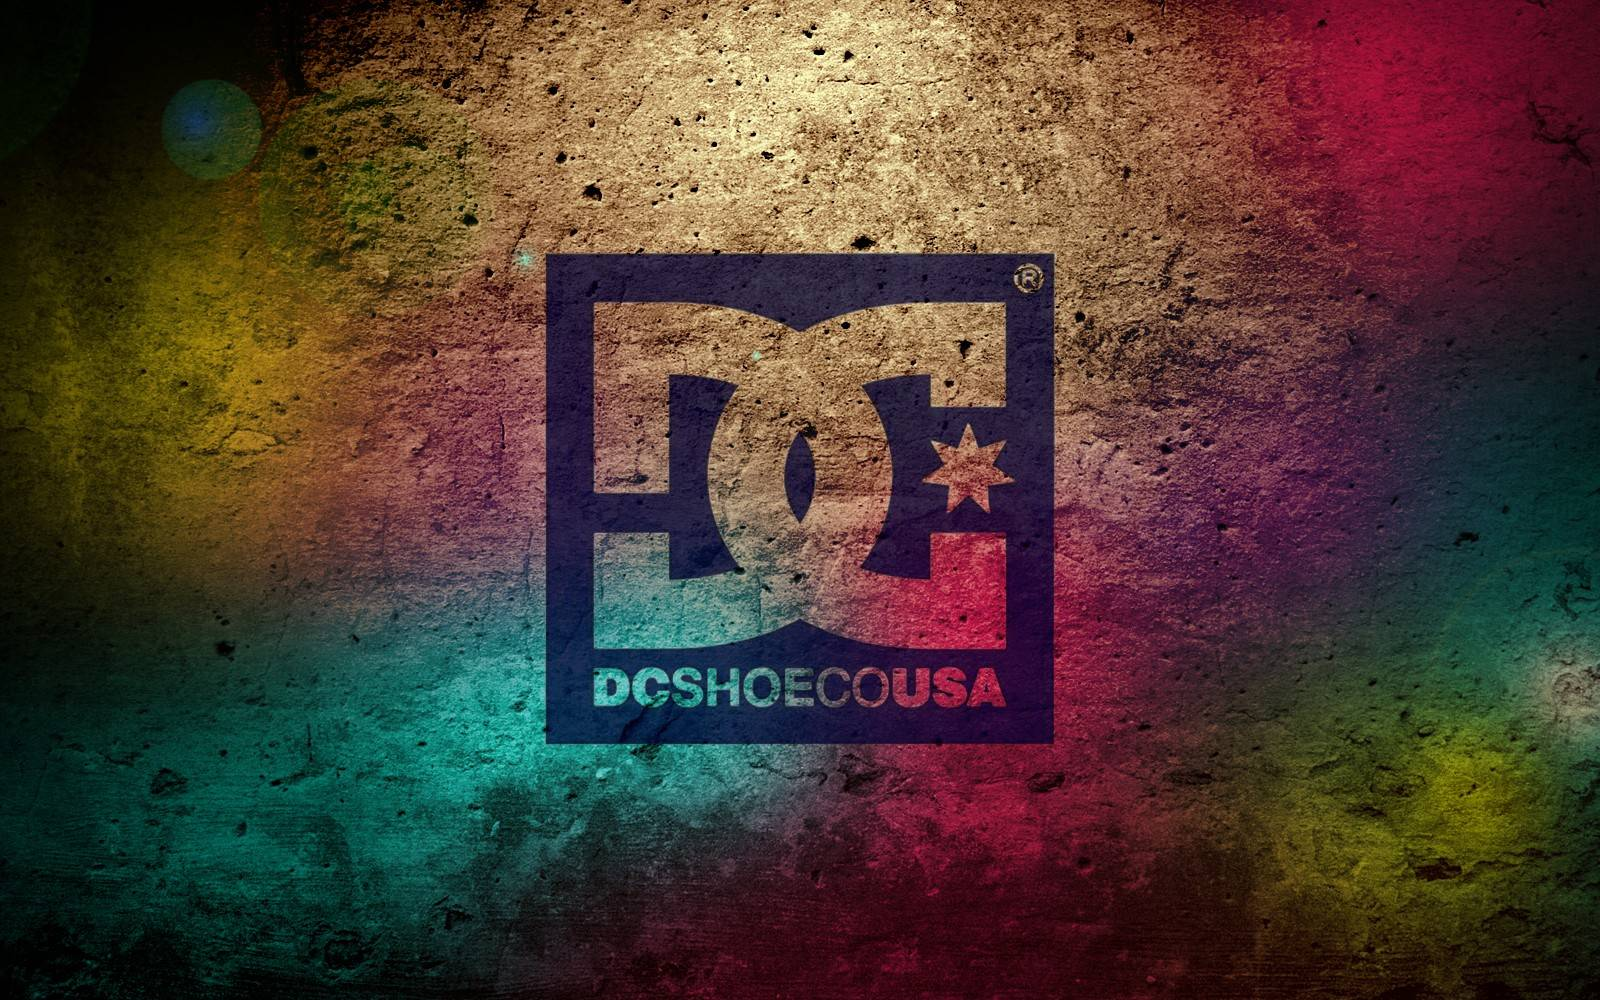 Dcshoes None 16001000 Wallpaper 945201 1600x1000